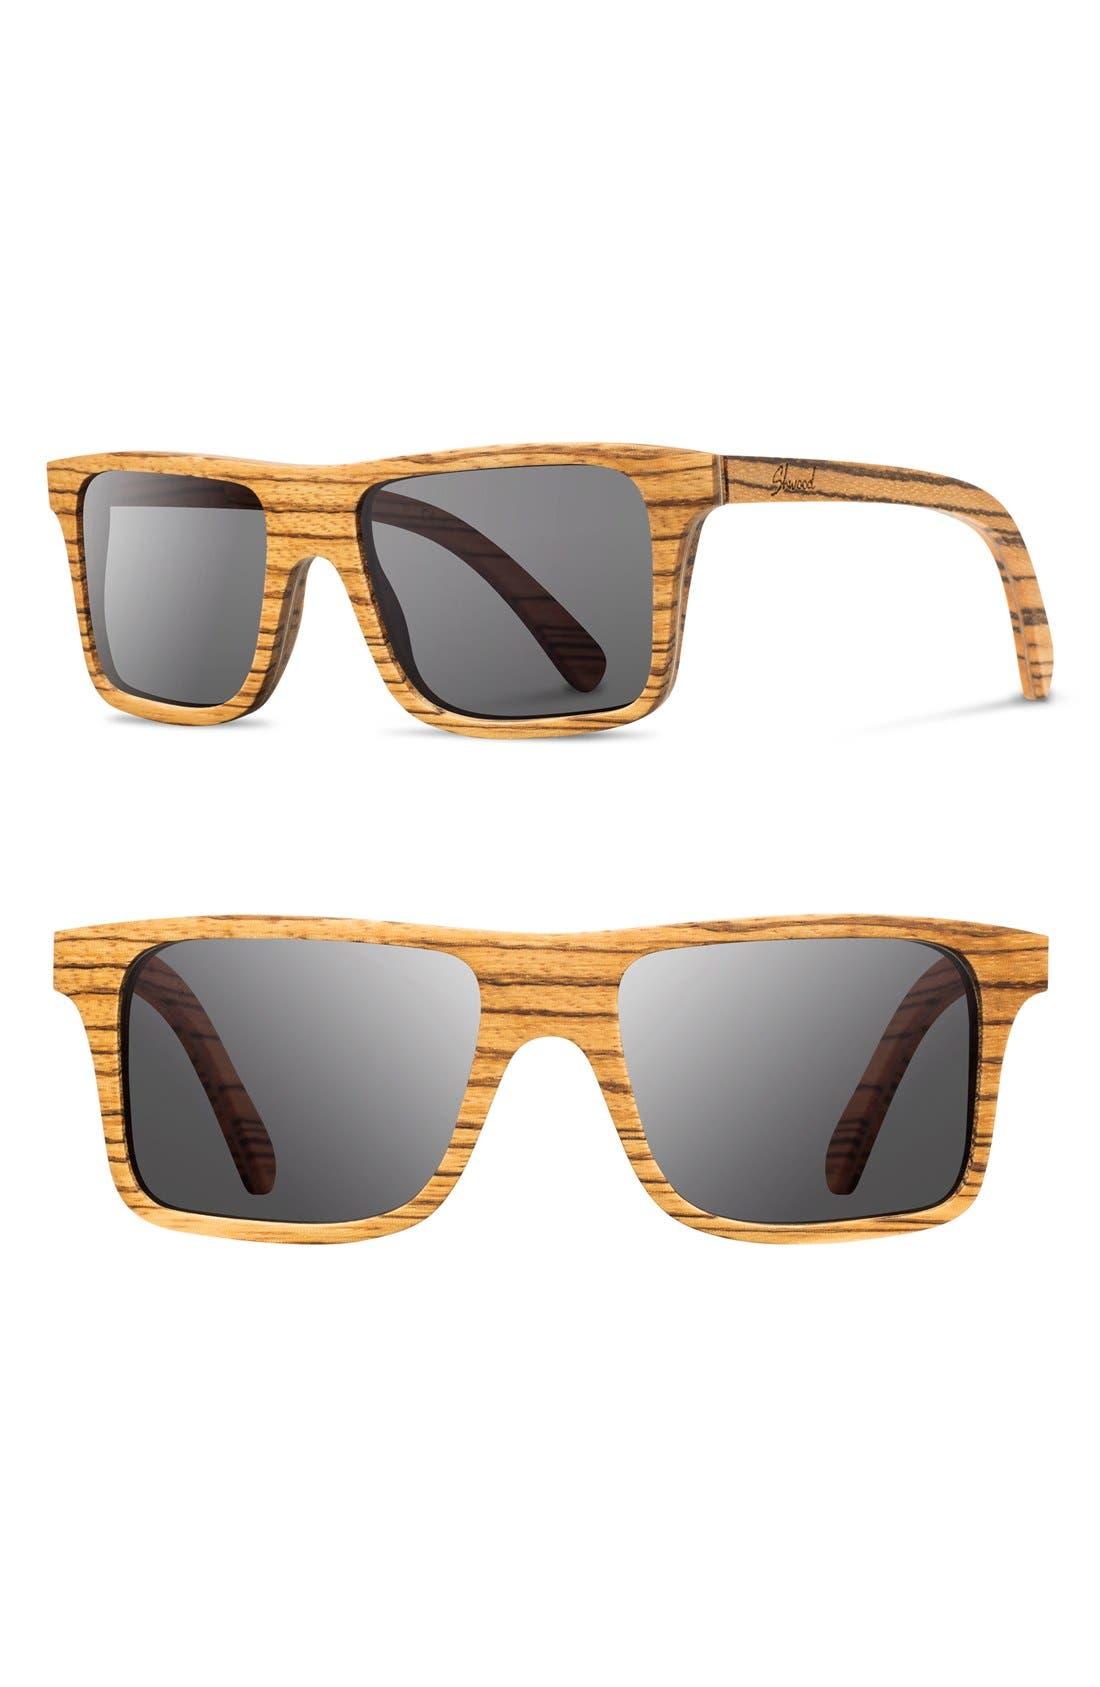 Alternate Image 1 Selected - Shwood 'Govy' 53mm Wood Sunglasses